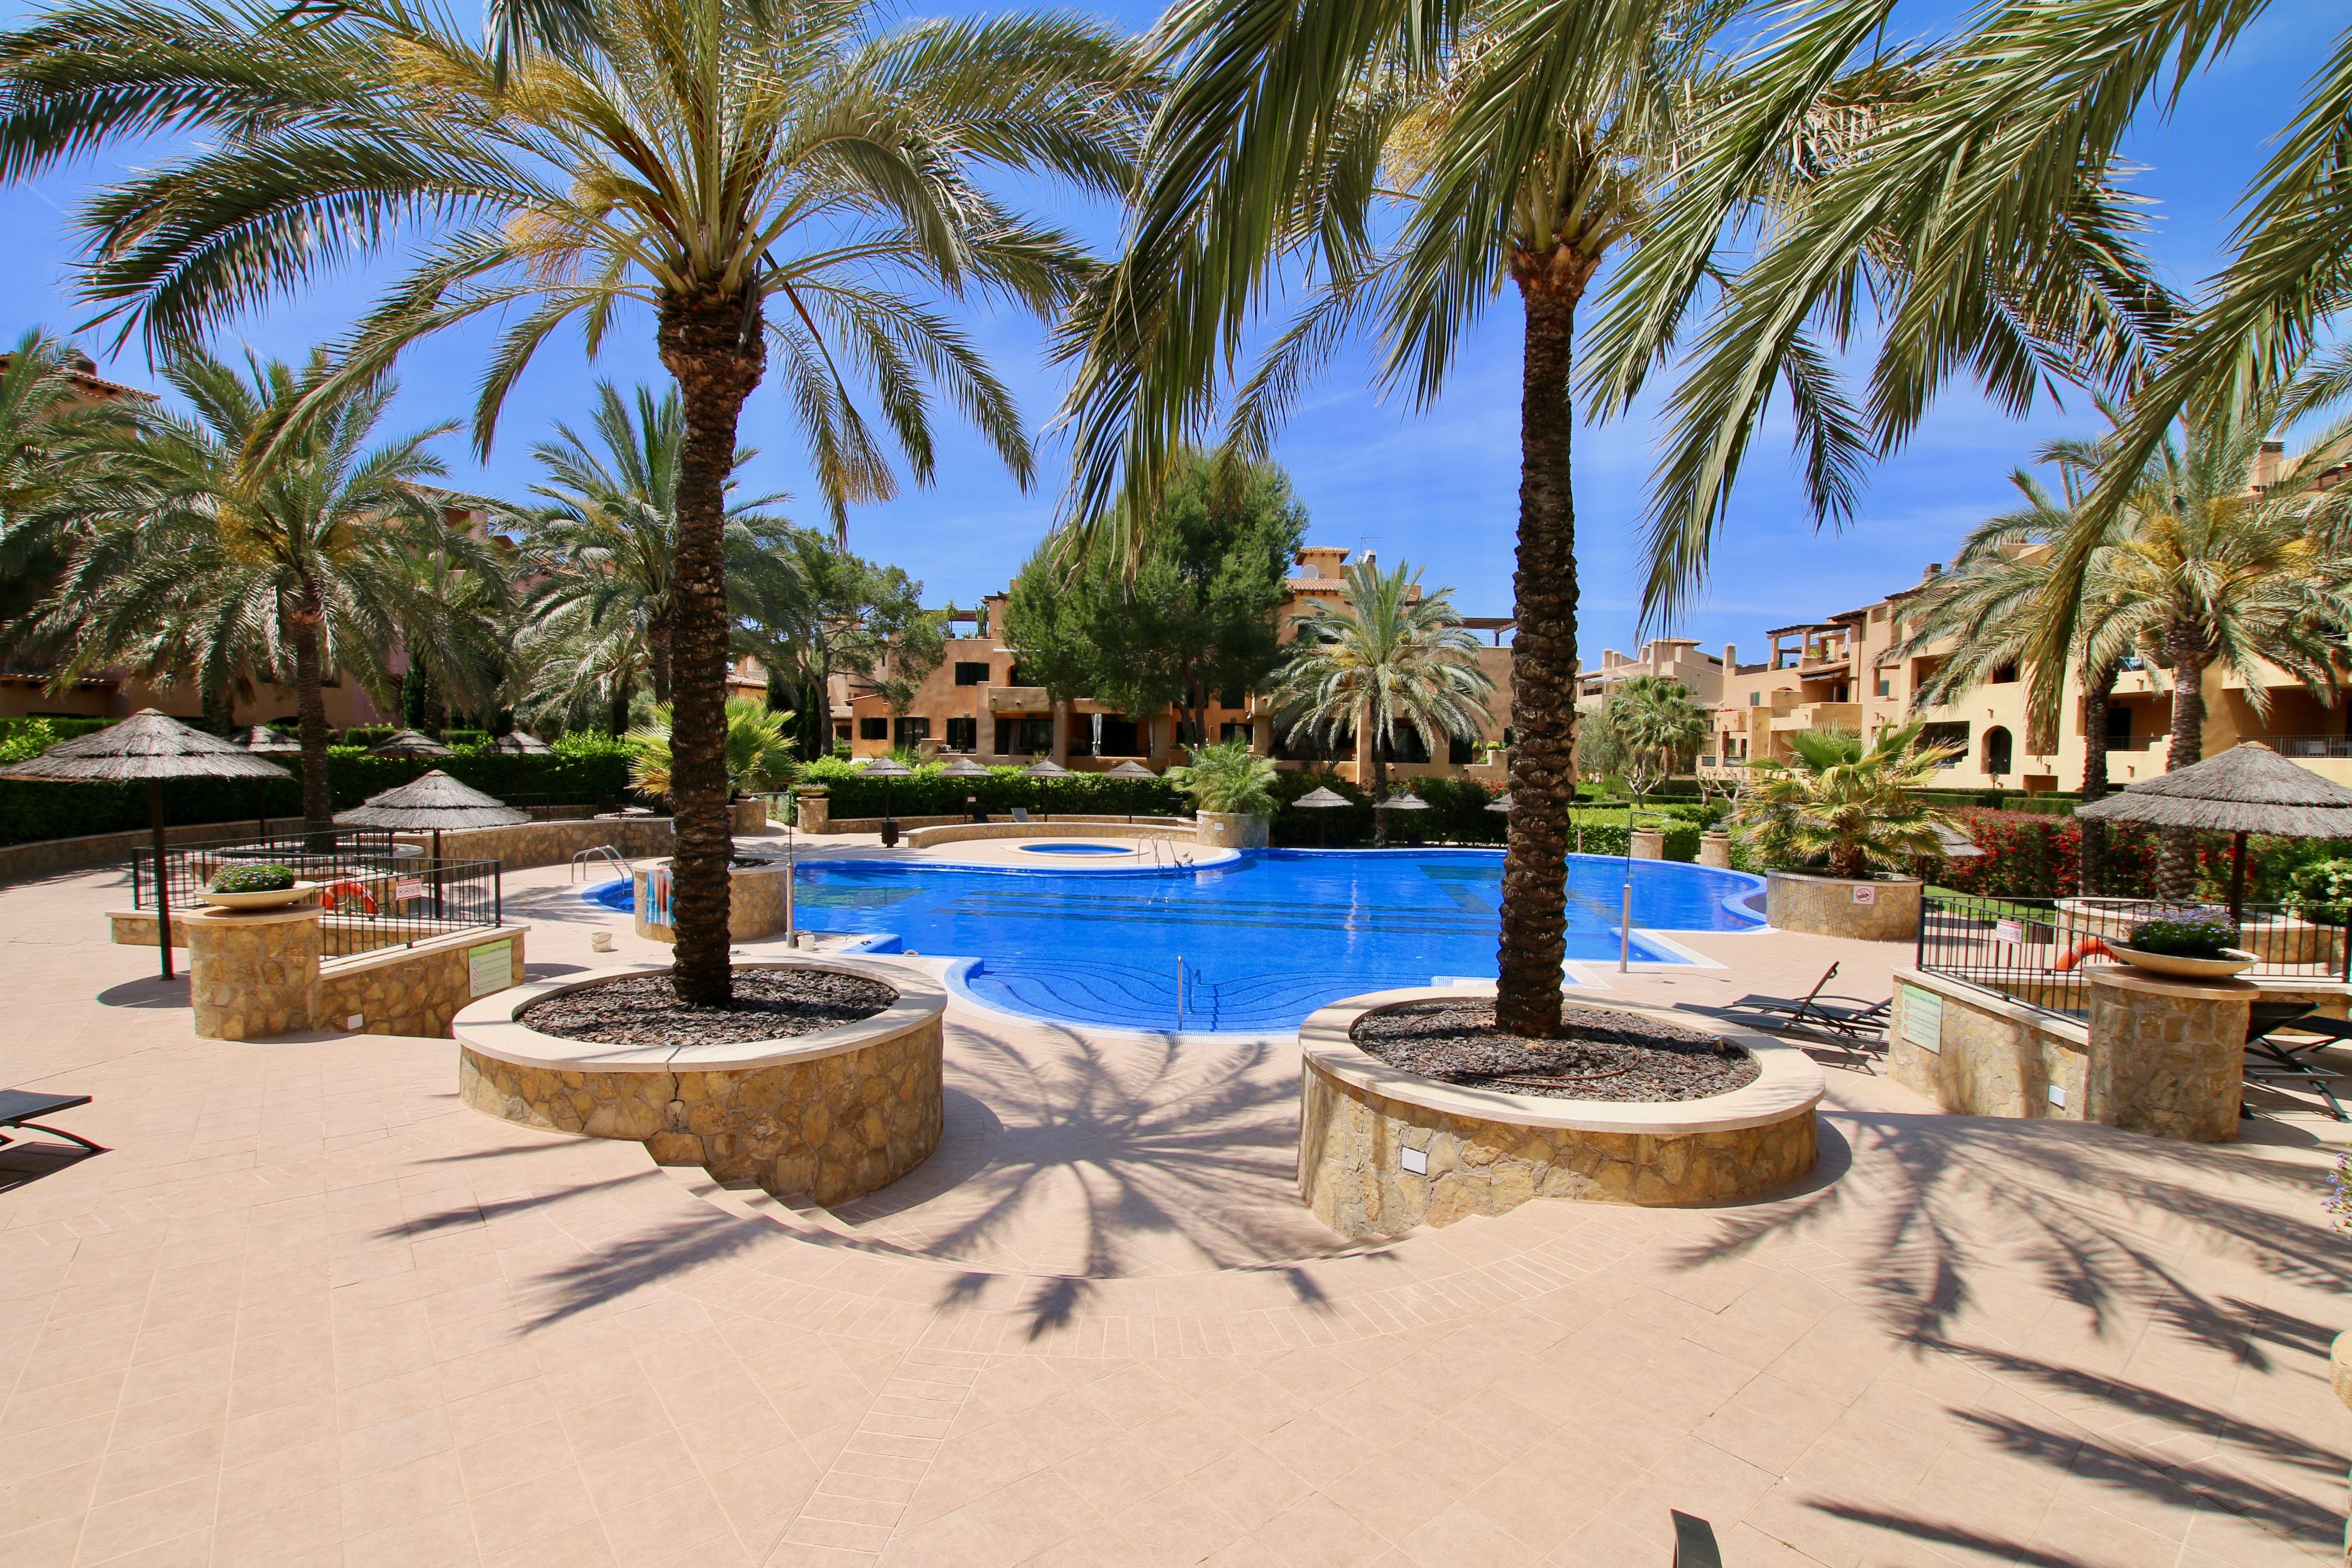 3 beds/ 2 baths apartment in amazing urbanization in Puigderros @ Mallorca